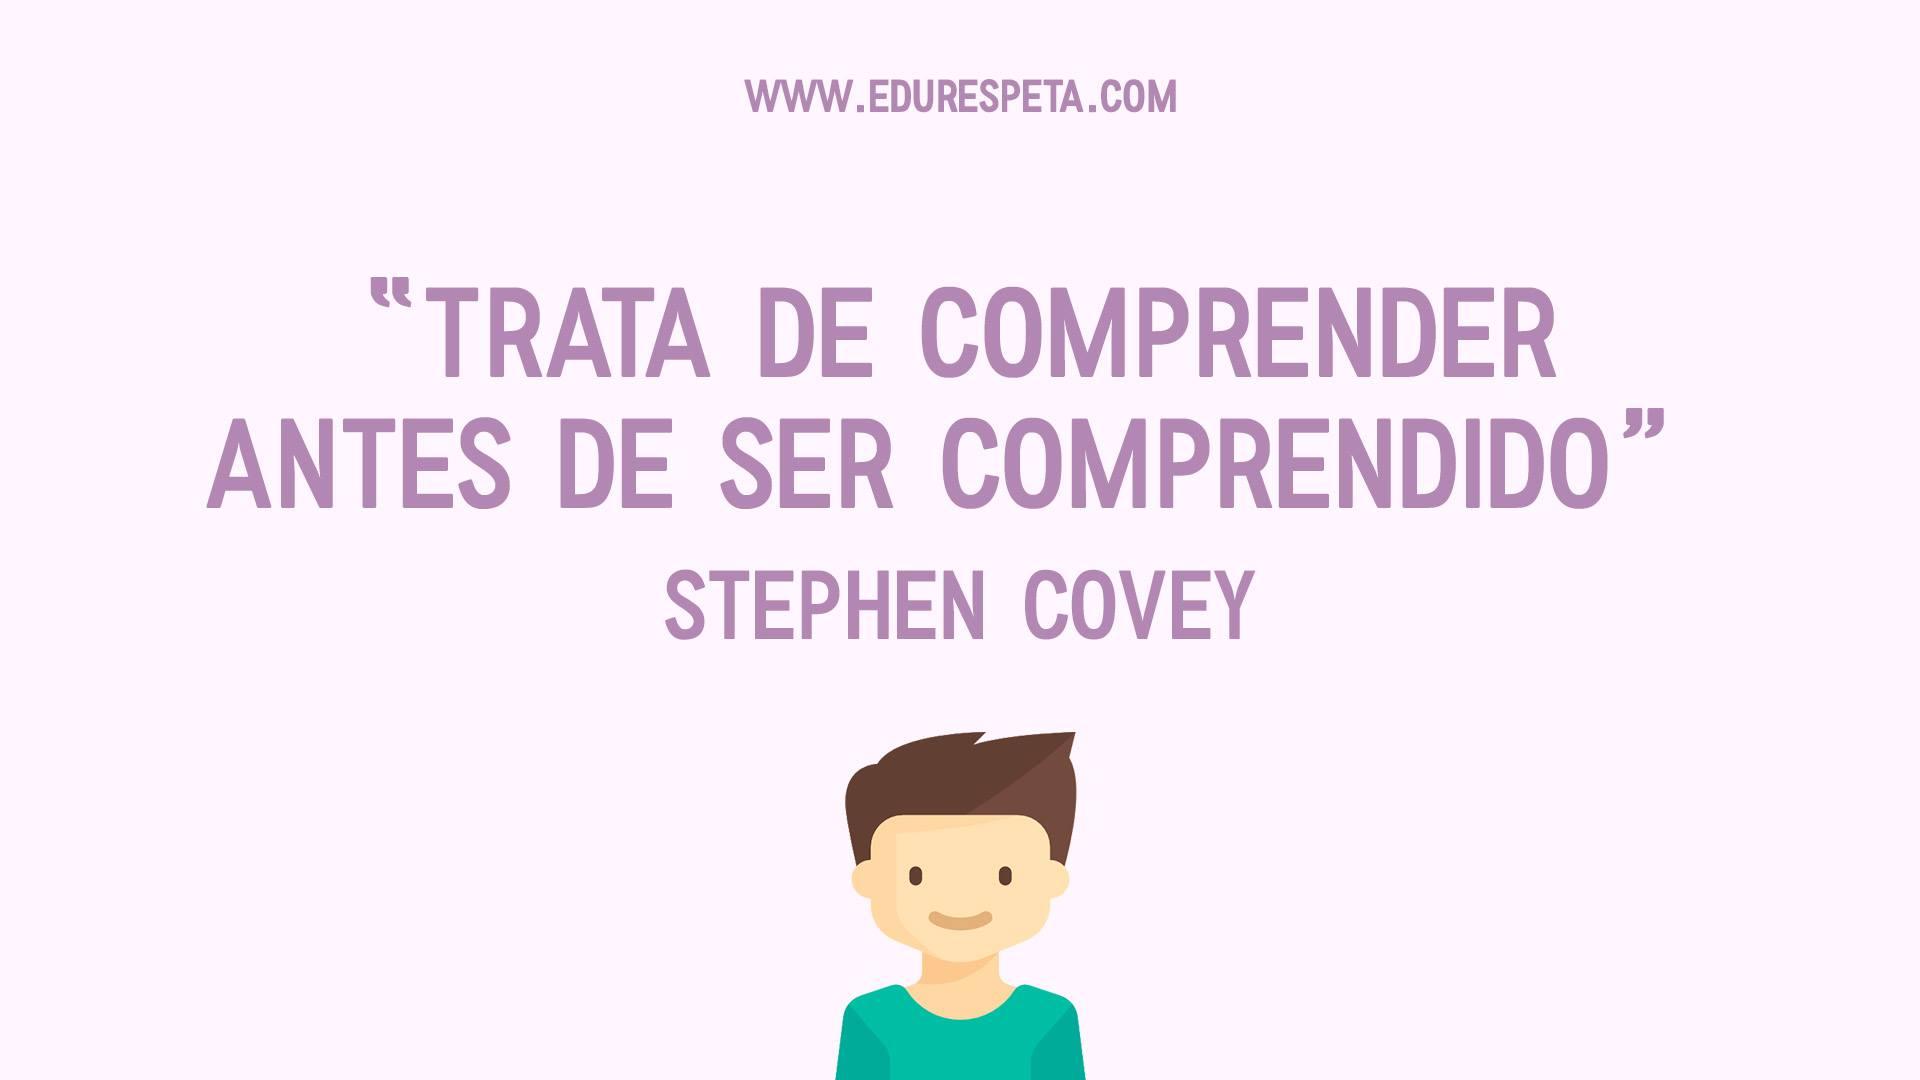 Trata de comprender antes de ser comprendido. Stephen Covey